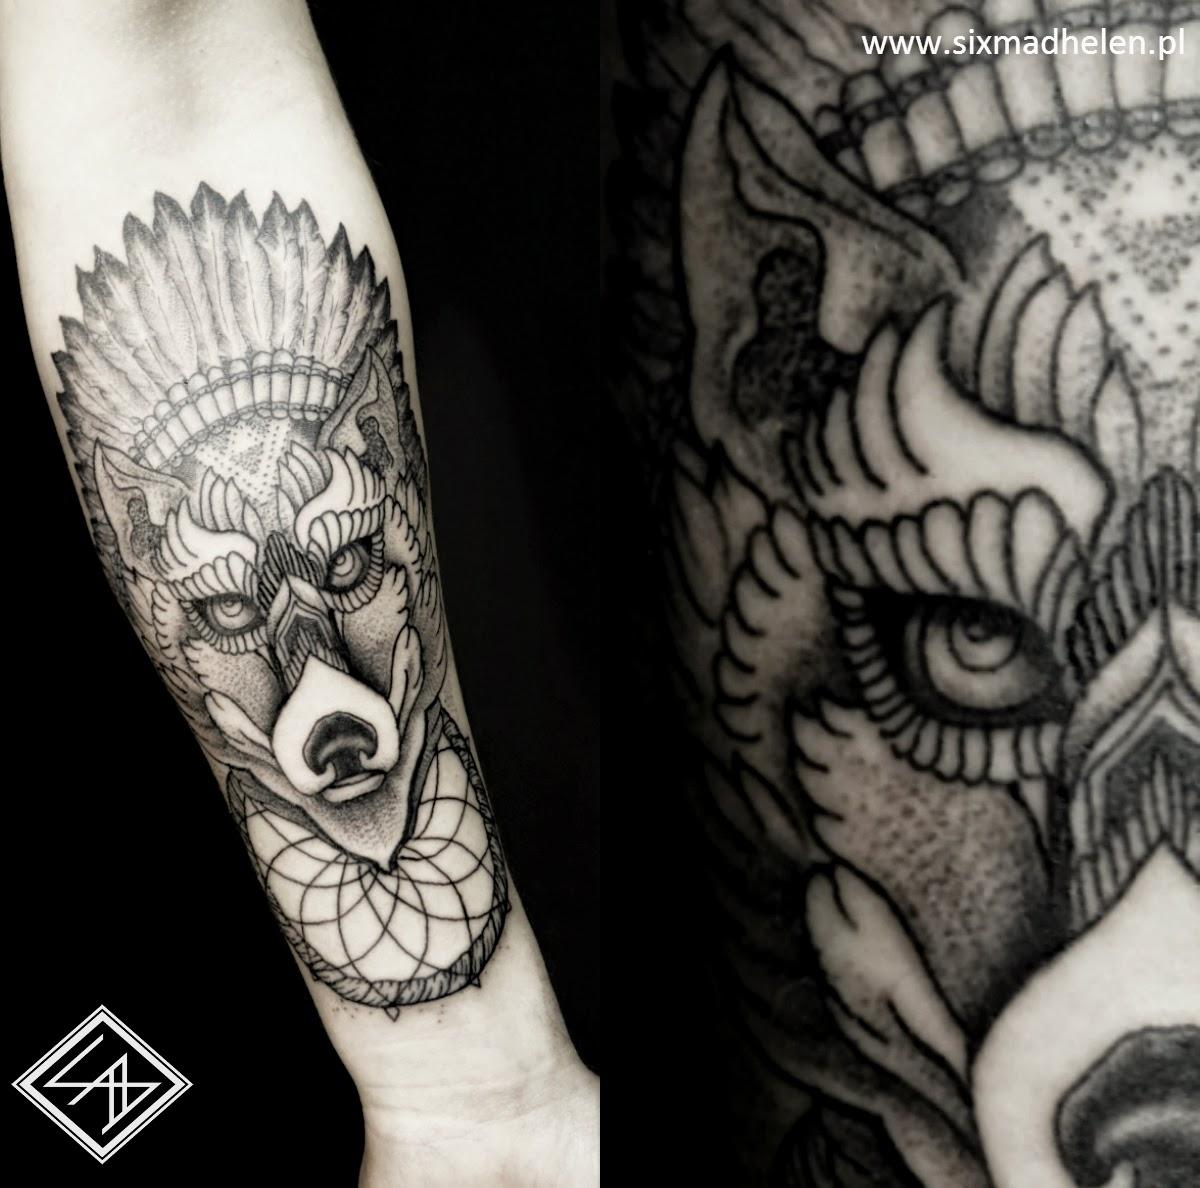 Six Mad Helen Tattoo Piercing Poznań Tatuaże Michał